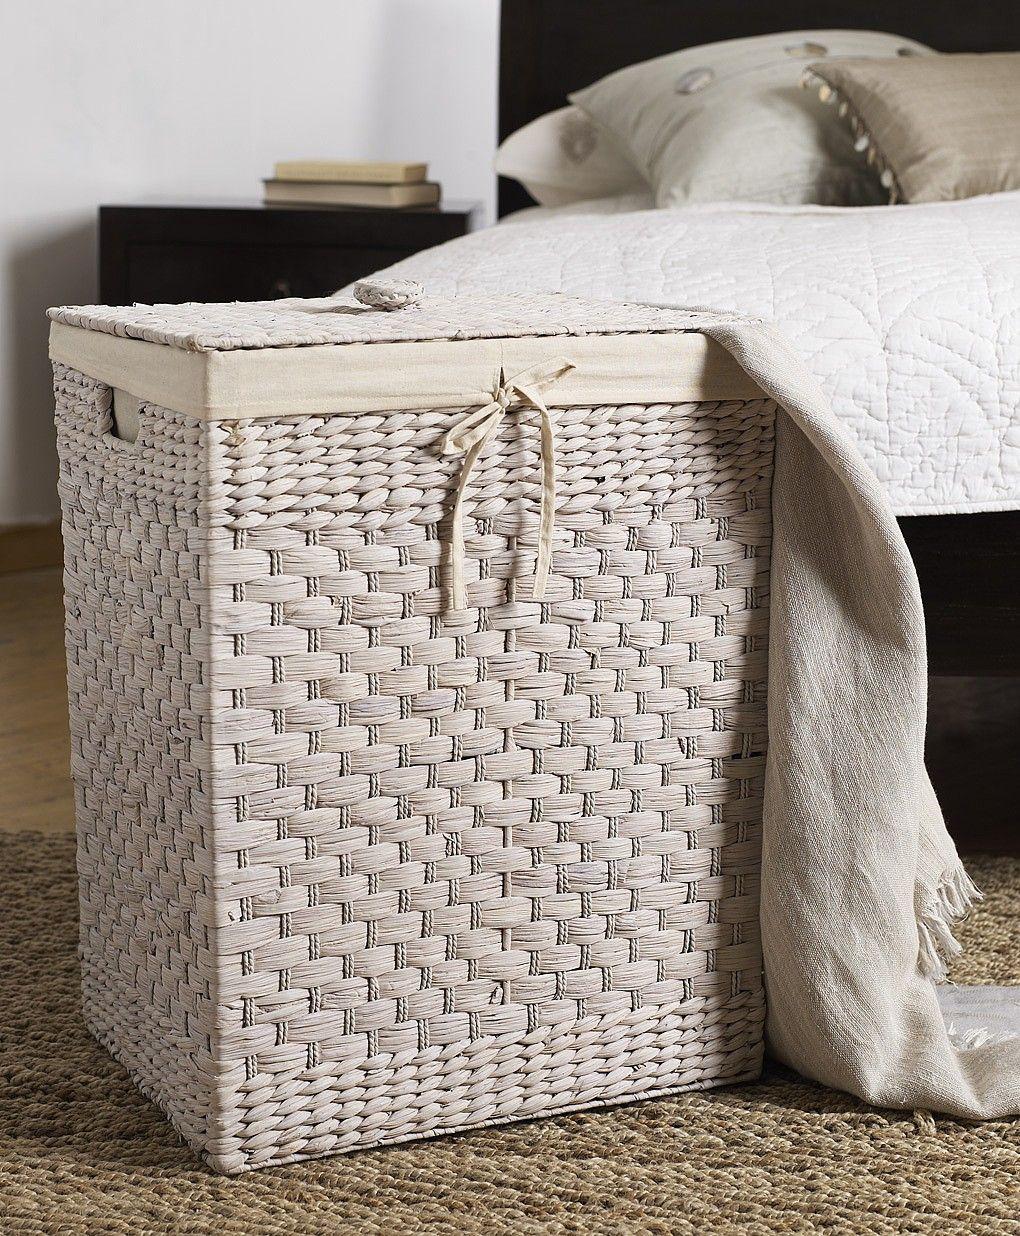 Water Hyacinth Laundry Hamper Laundry Hamper Laundry Basket